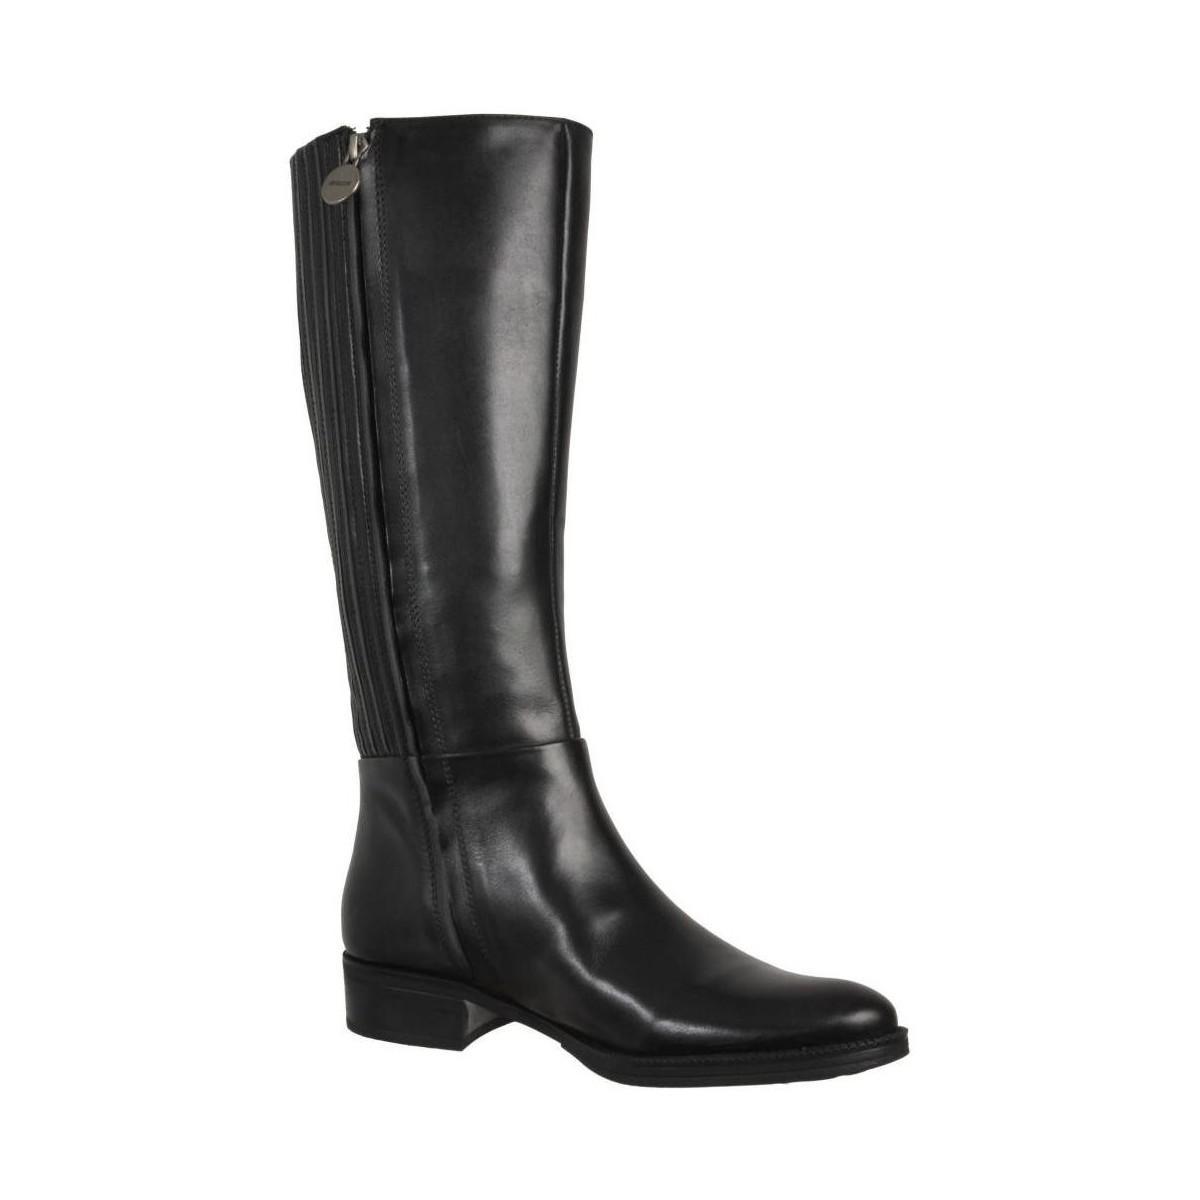 Geox Mendi St P Women's High Boots In Black